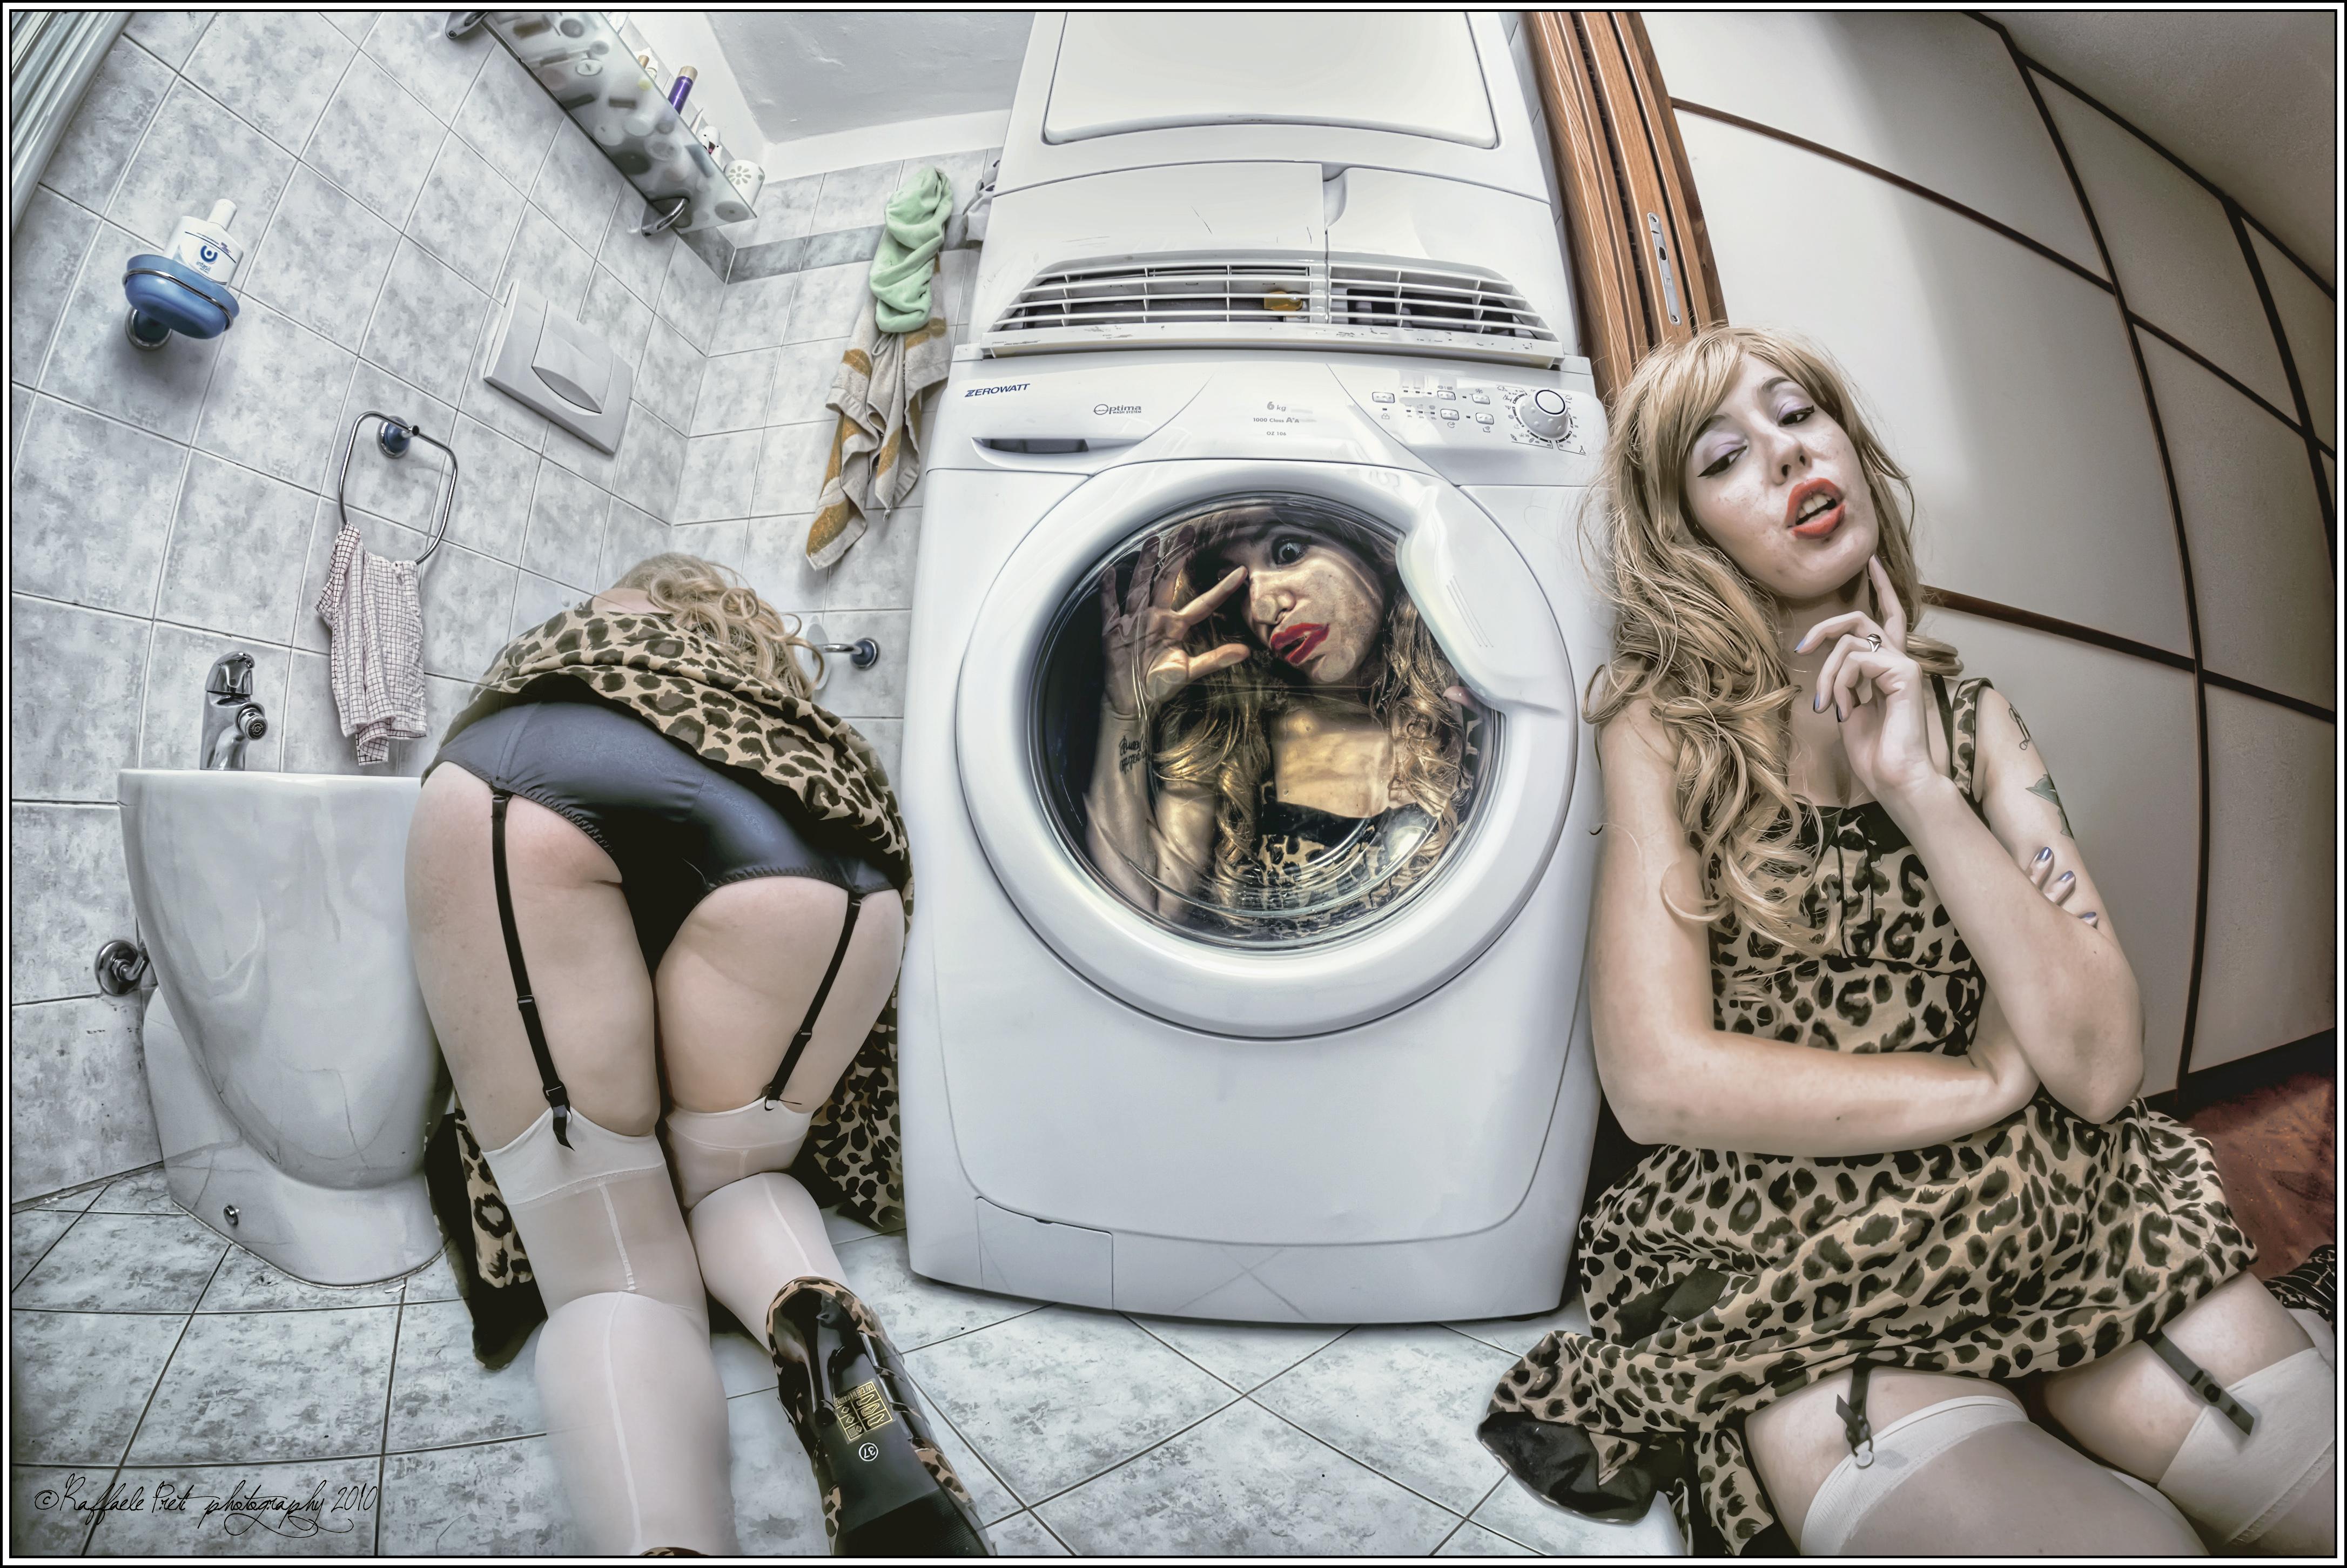 model ass photography surreal HDR fashion girl girls photograph crazy image snapshot mad photo shoot human